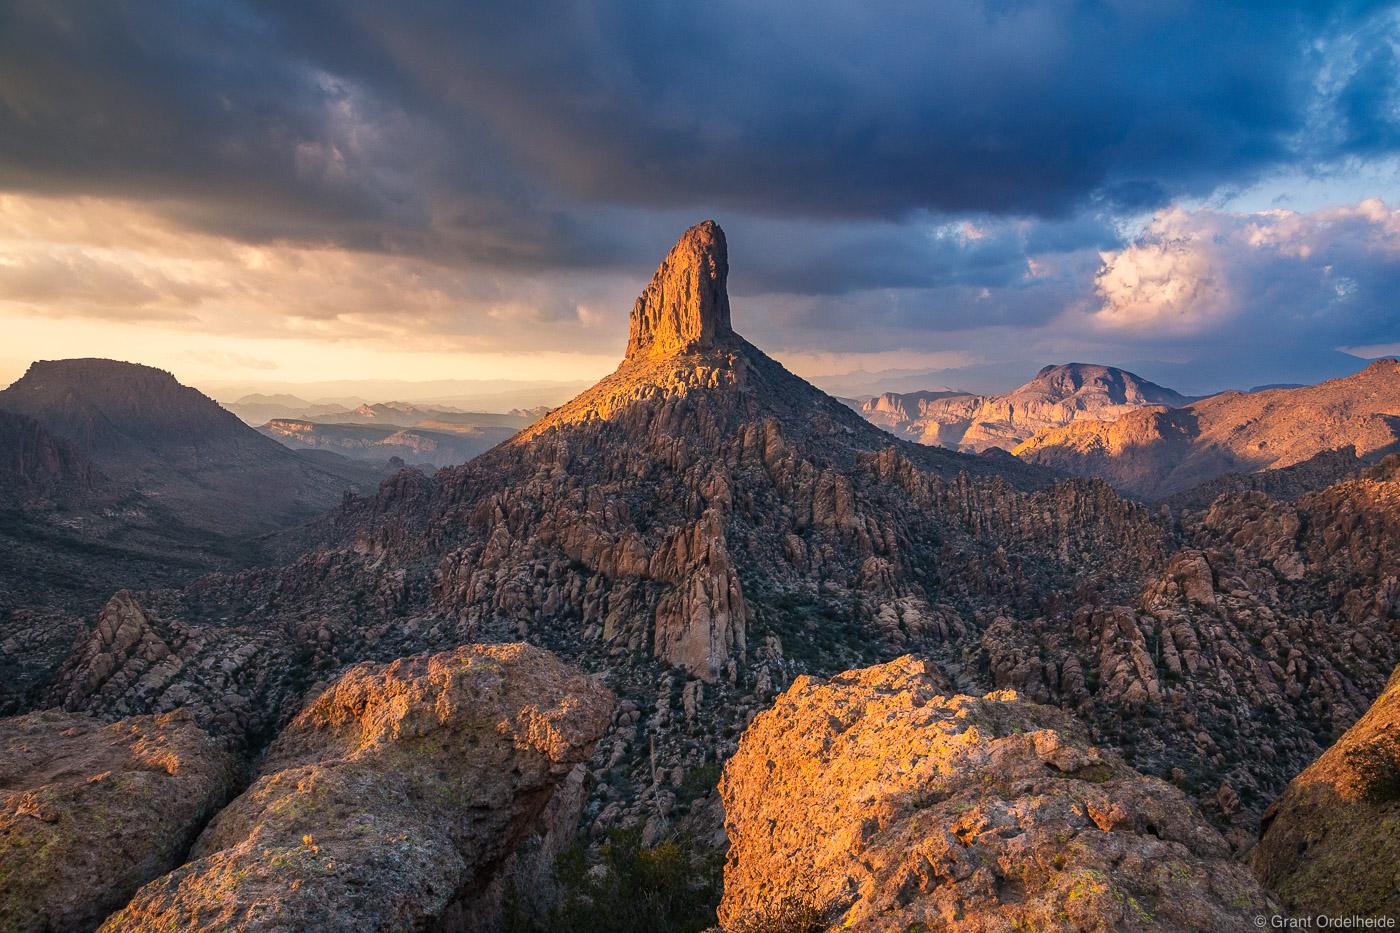 Weavers Needle in the Superstition Mountains near Phoenix, Arizona.